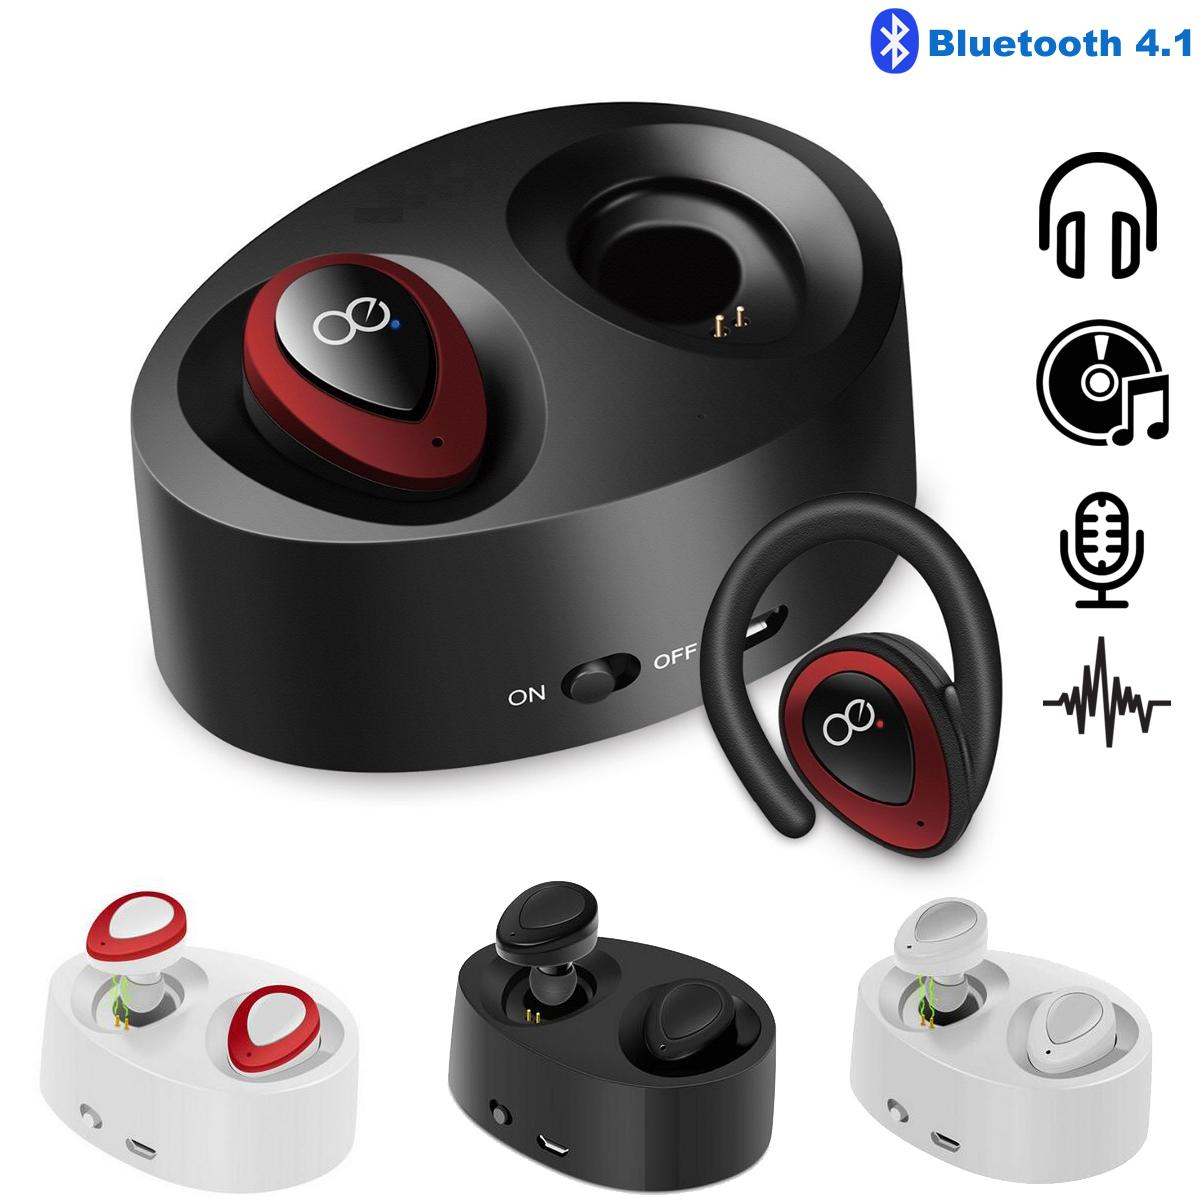 Mini TWS K2 Kablosuz Twins Bluetooth Stereo Kulak Kulaklık Kulaklık Kulakiçi Kulaklık ile Şarj Soket Kulaklık